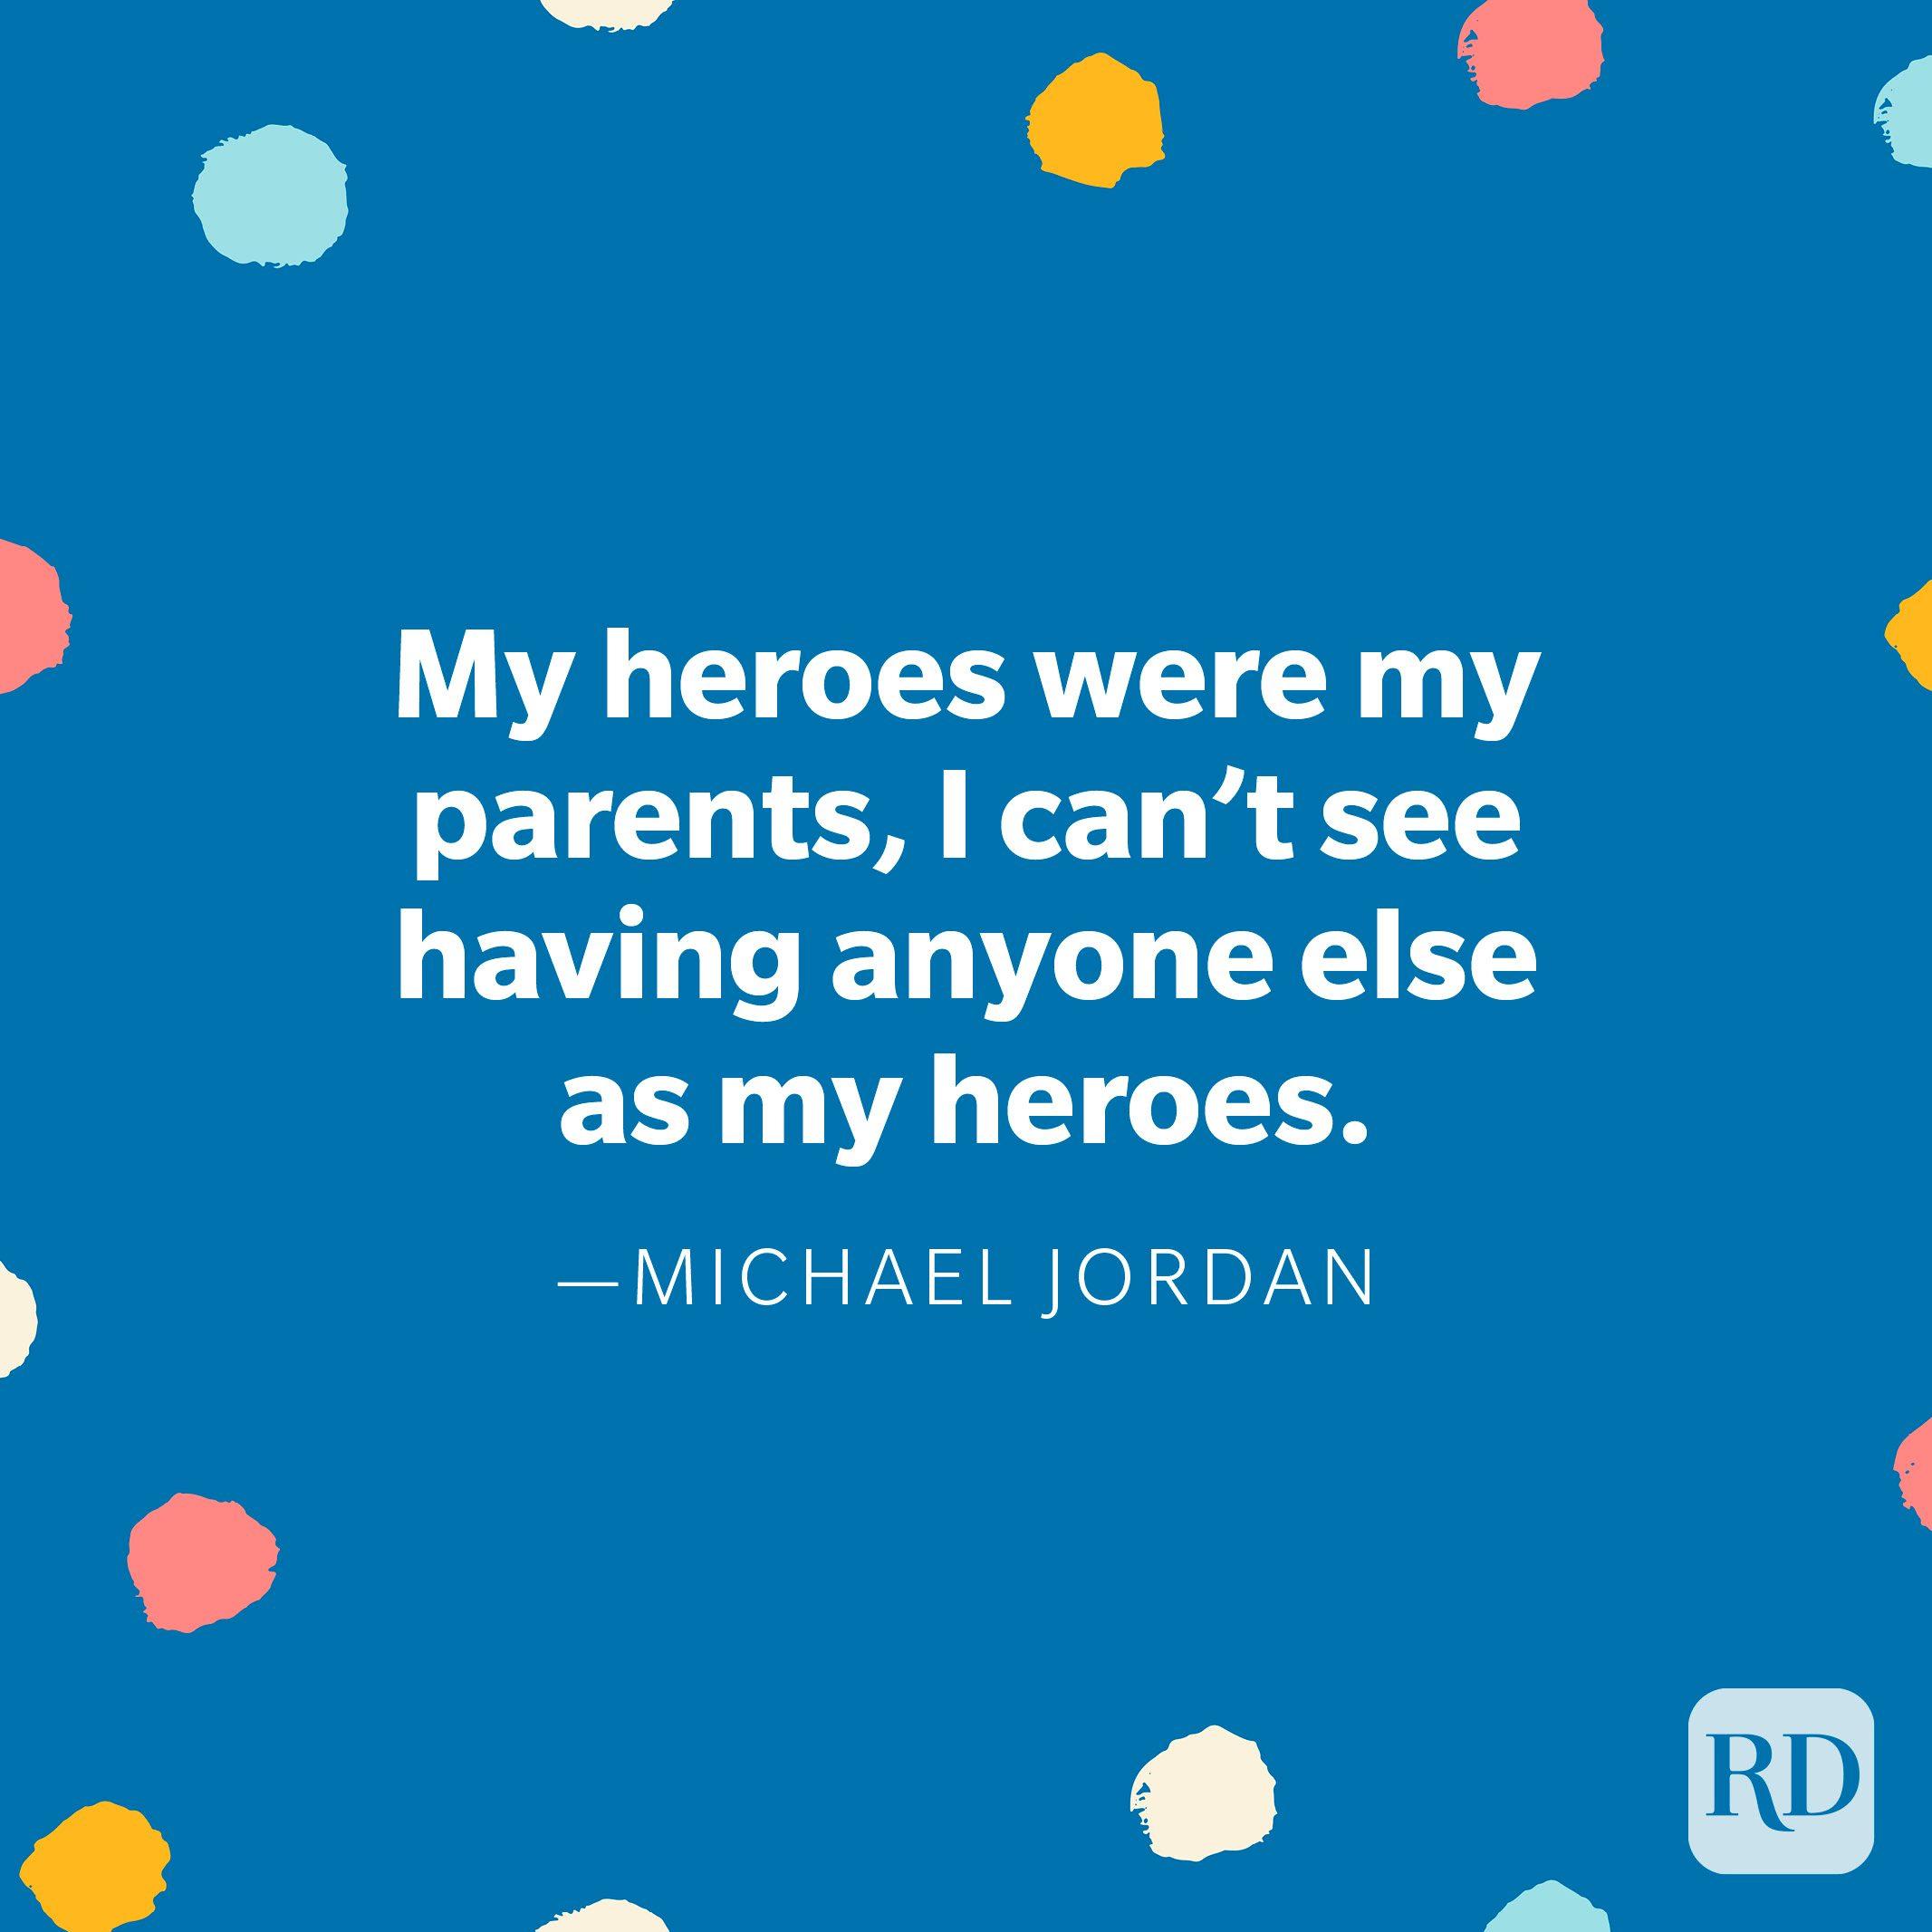 """My heroes were my parents, I can't see having anyone else as my heroes."" — Michael Jordan"